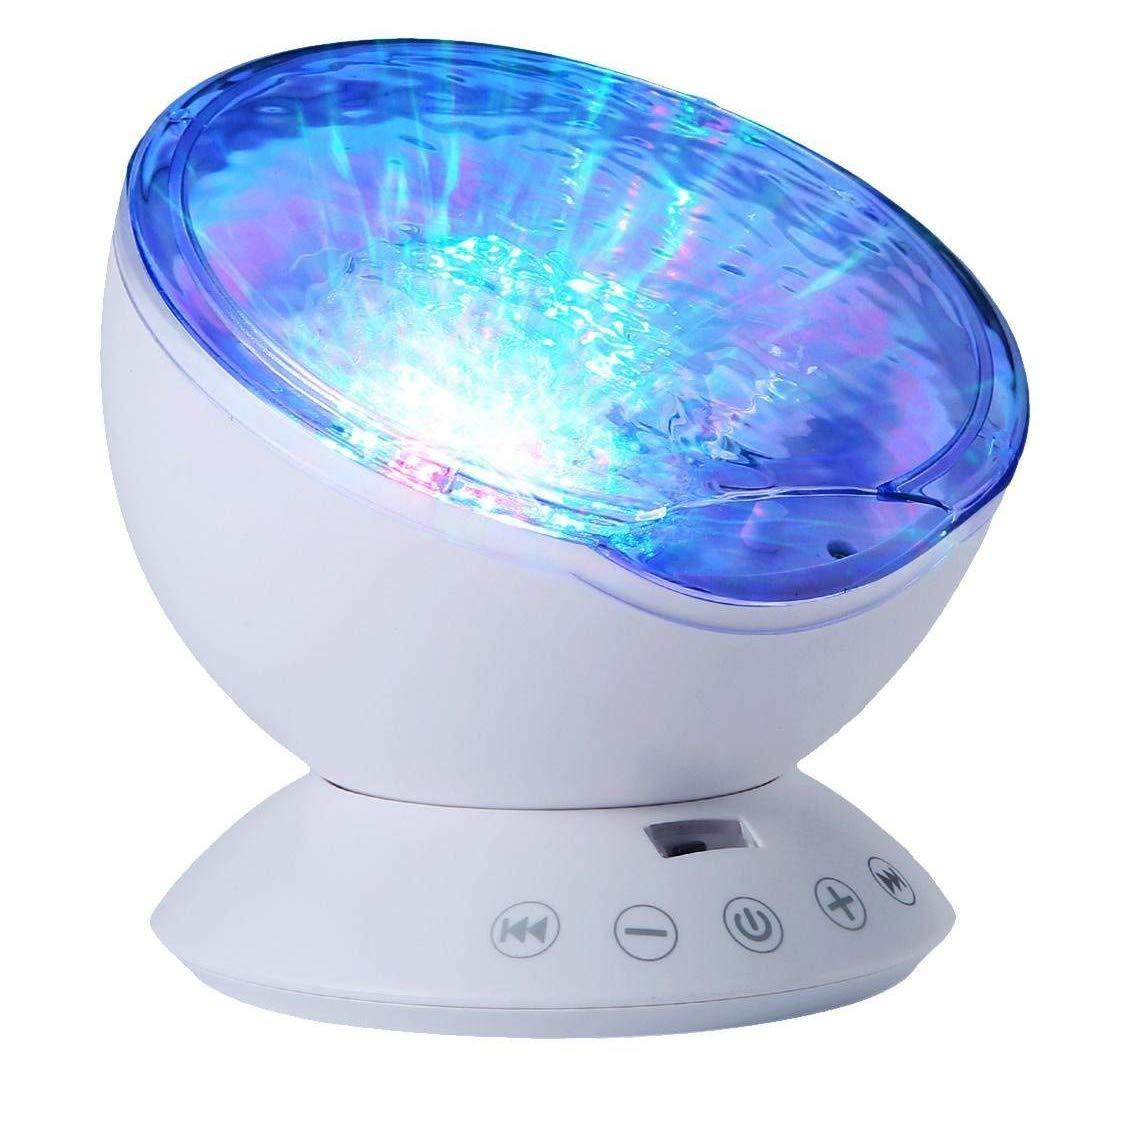 LgoodL Ocean Night Light USB Wave Light Rotating Projector Lamp and  Bluetooth Speaker, 12 LED